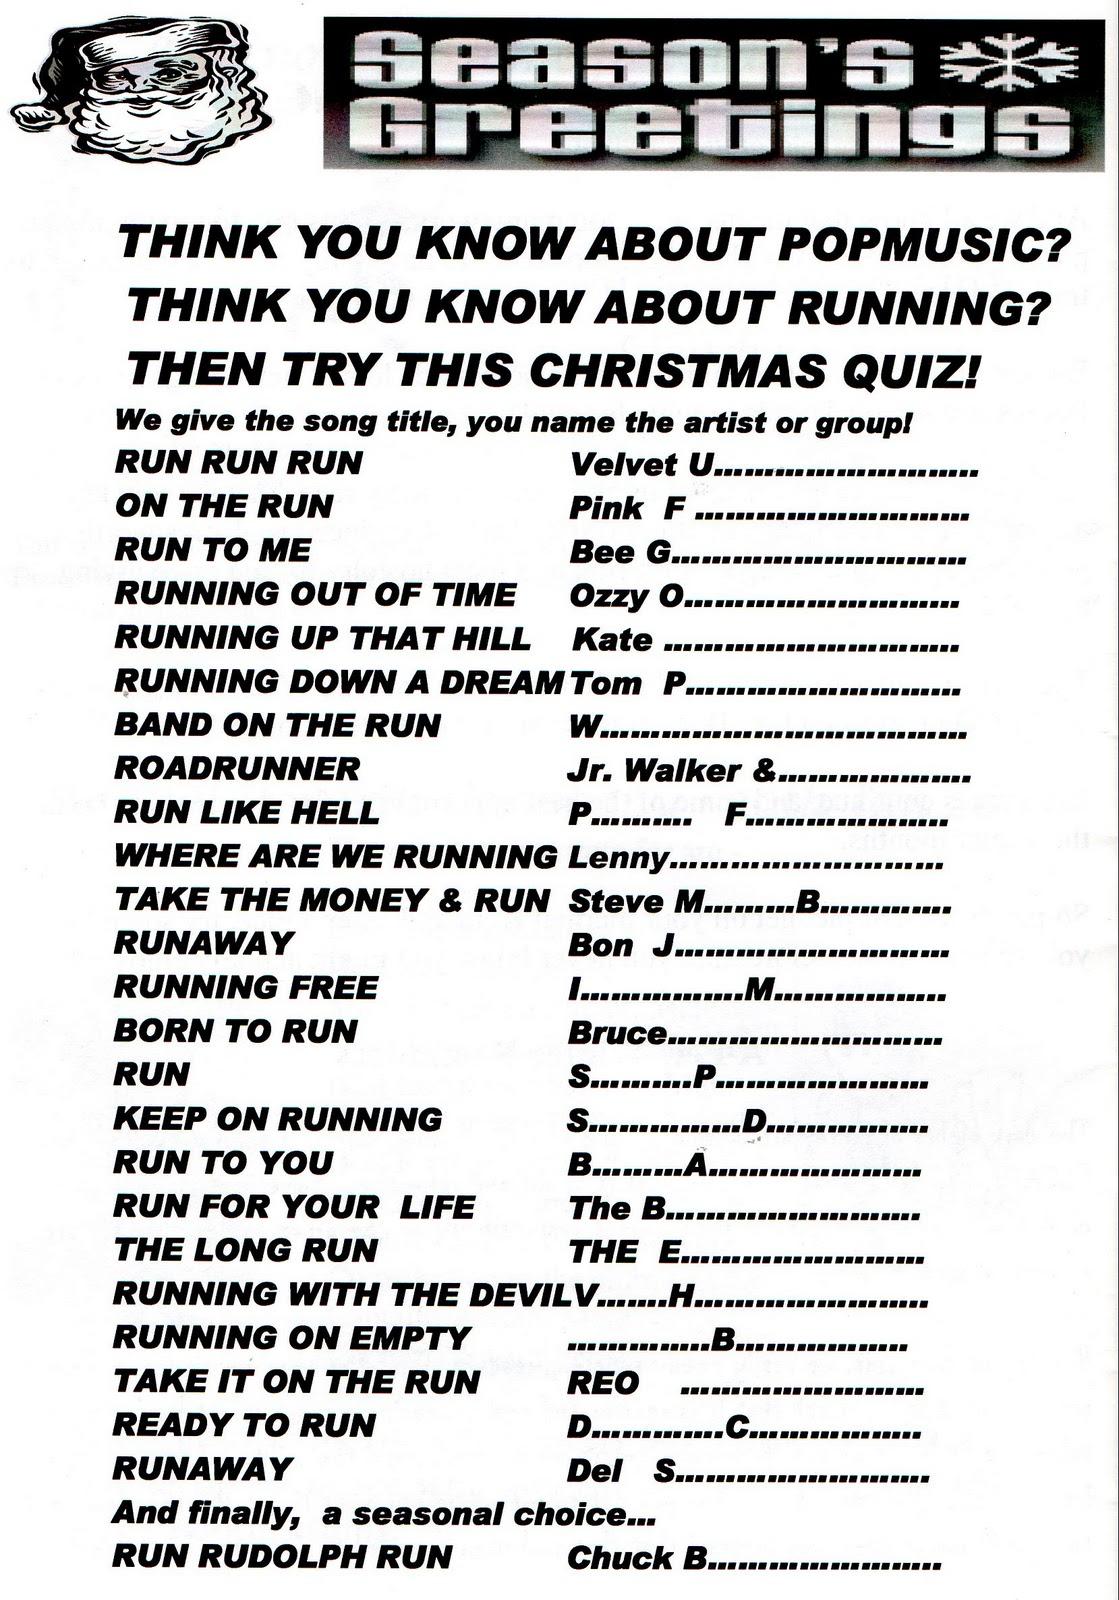 Running On Empty Run Music Quiz For Christmas